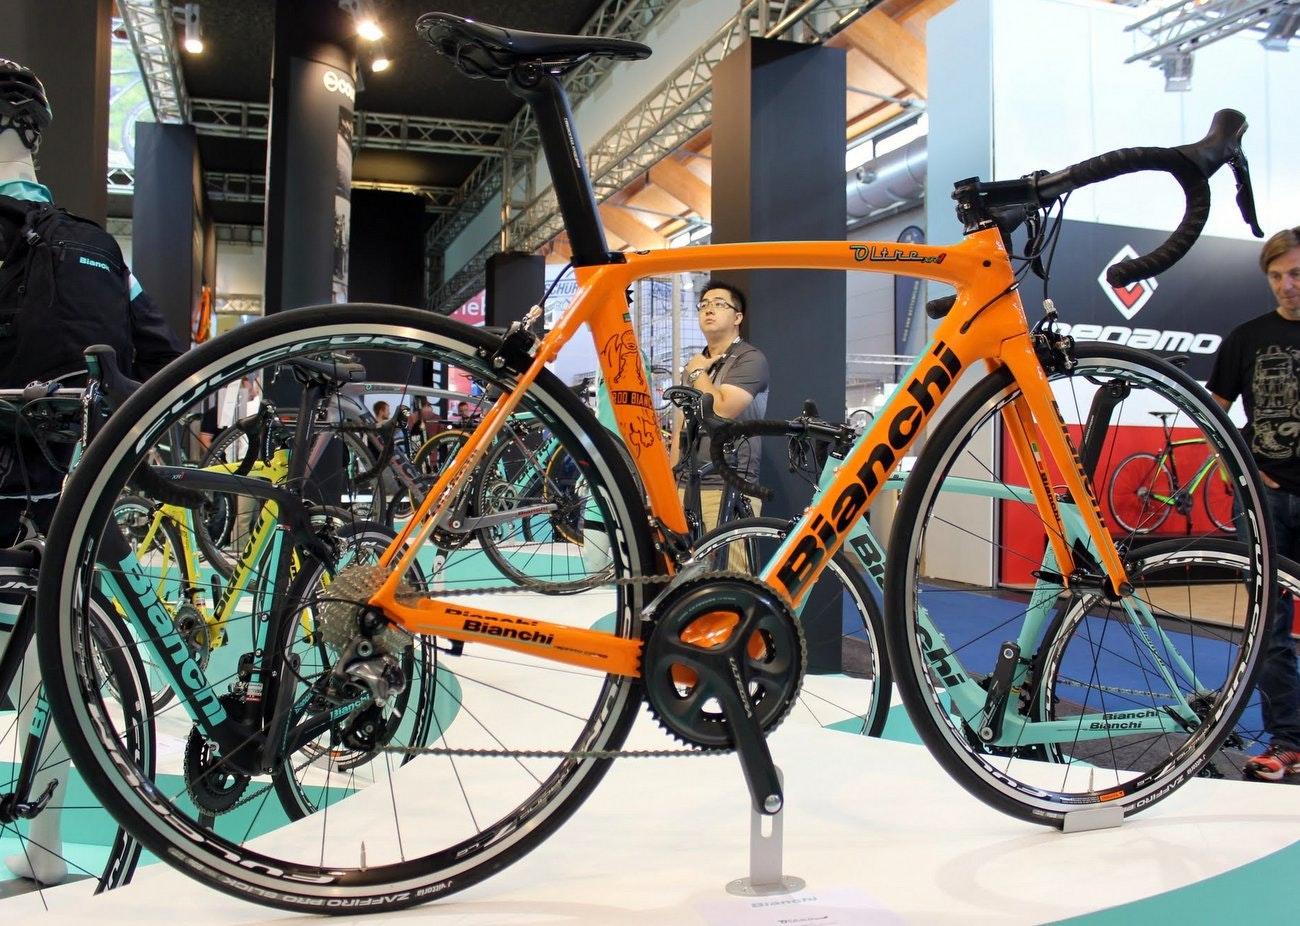 Bianchi 2016 road bikes: Bianchi Oltre XR1 road bike (Pic: George Scott/Factory Media)